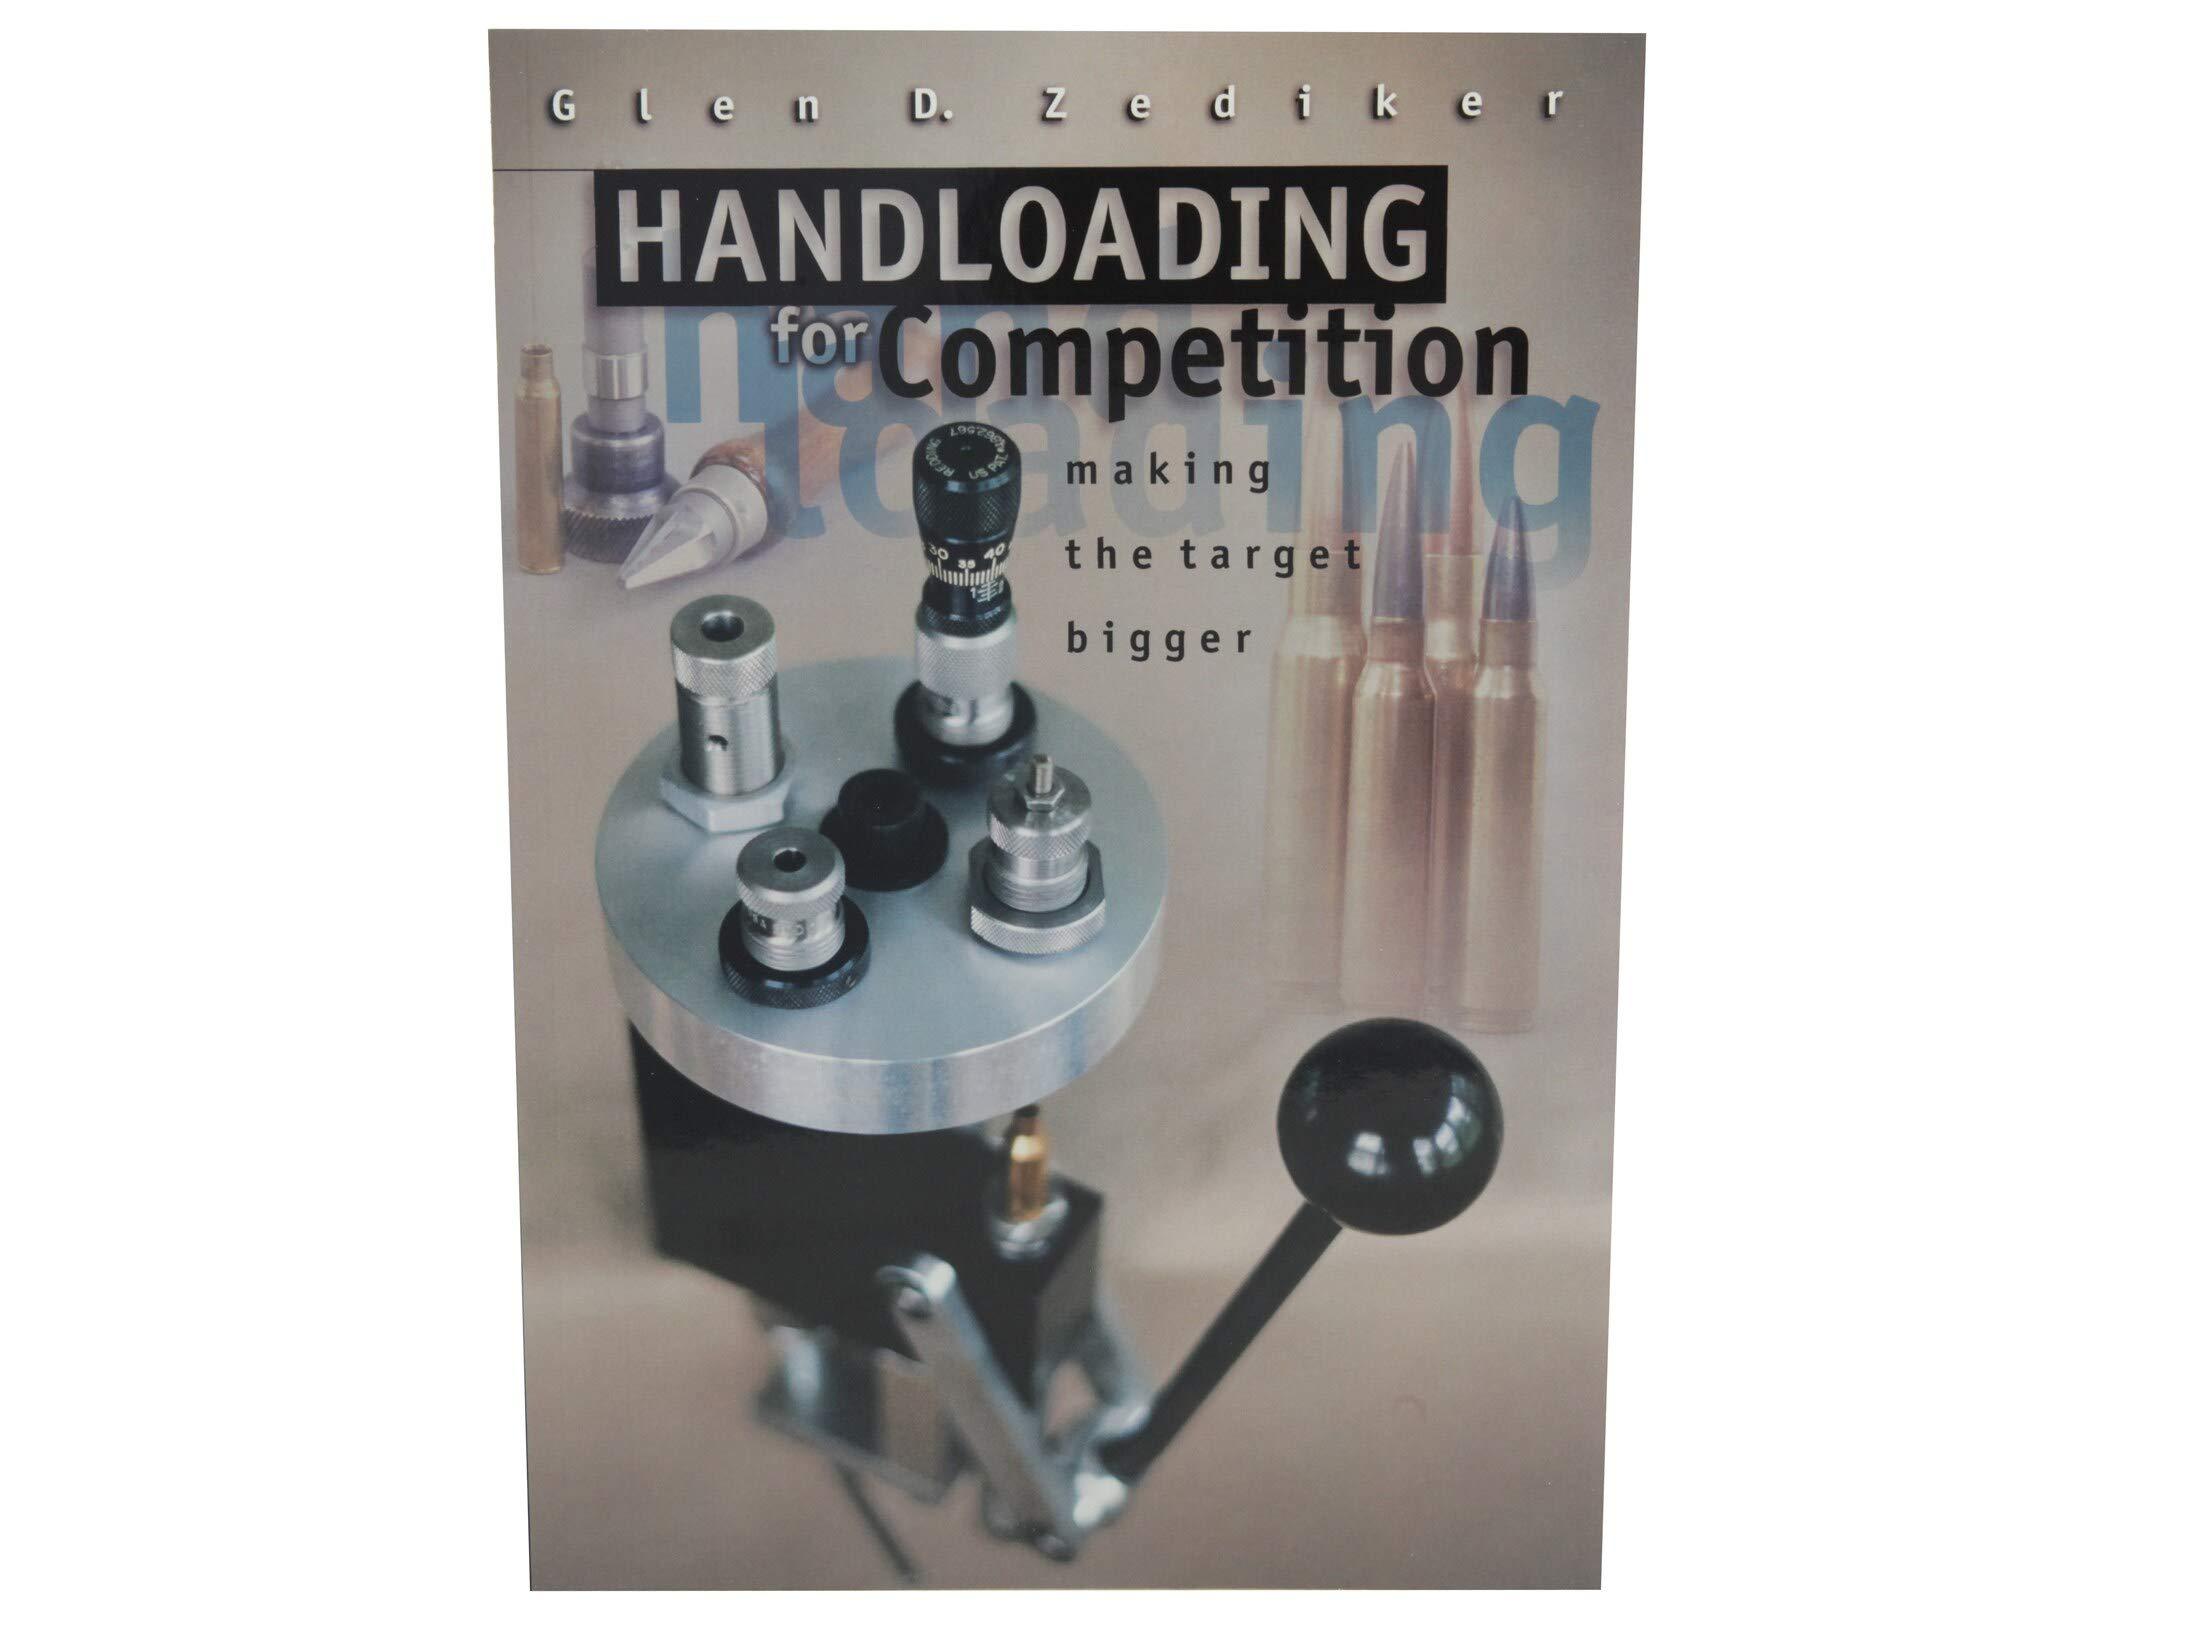 Handloading for Competition Making the Target Bigger : Glen